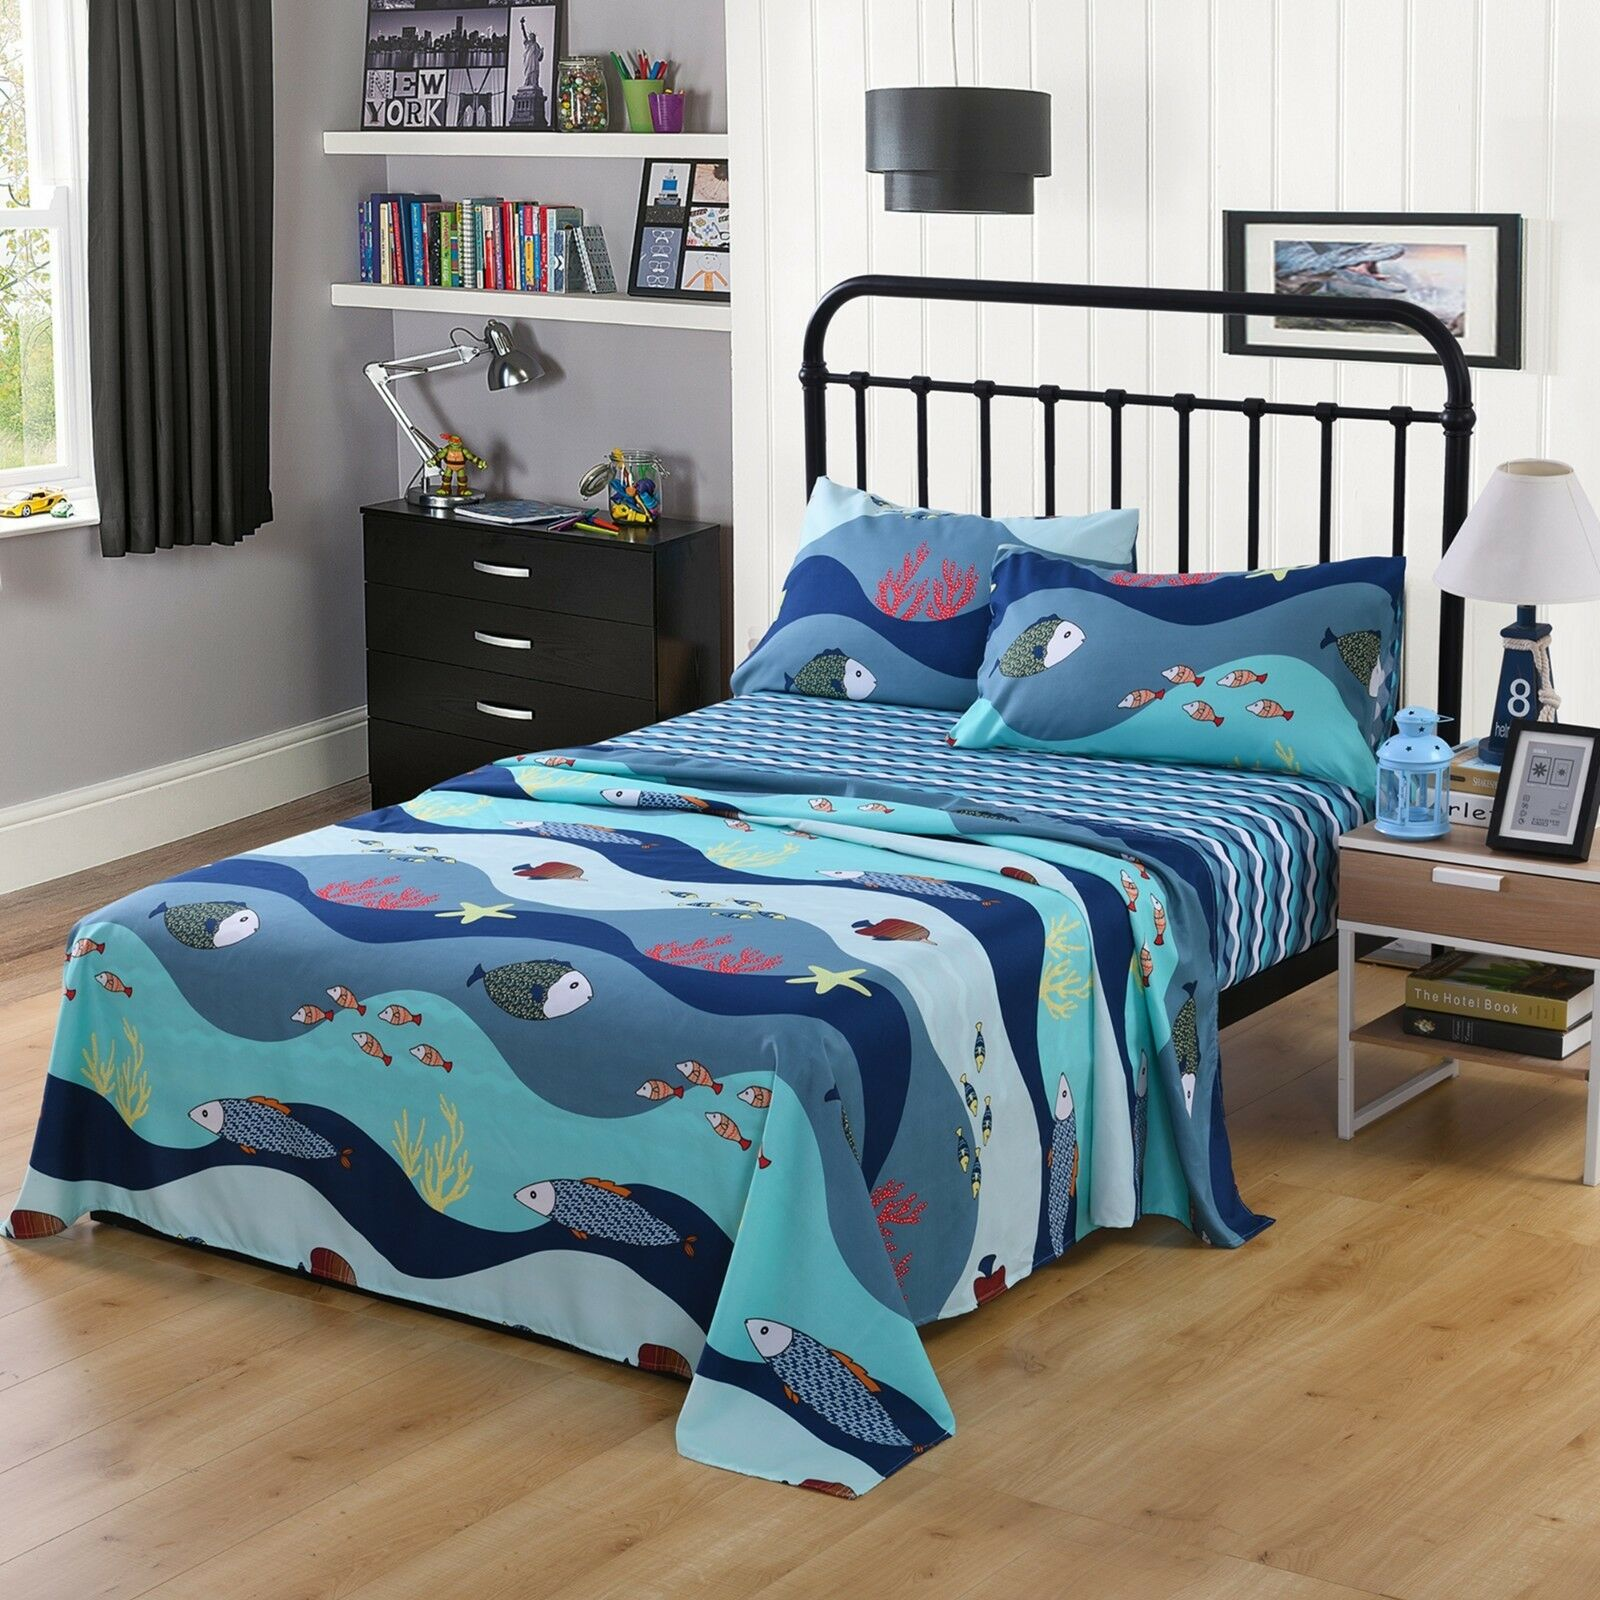 Bed Sheets for Kids Girls Boys Teens Children Beds Set, 276